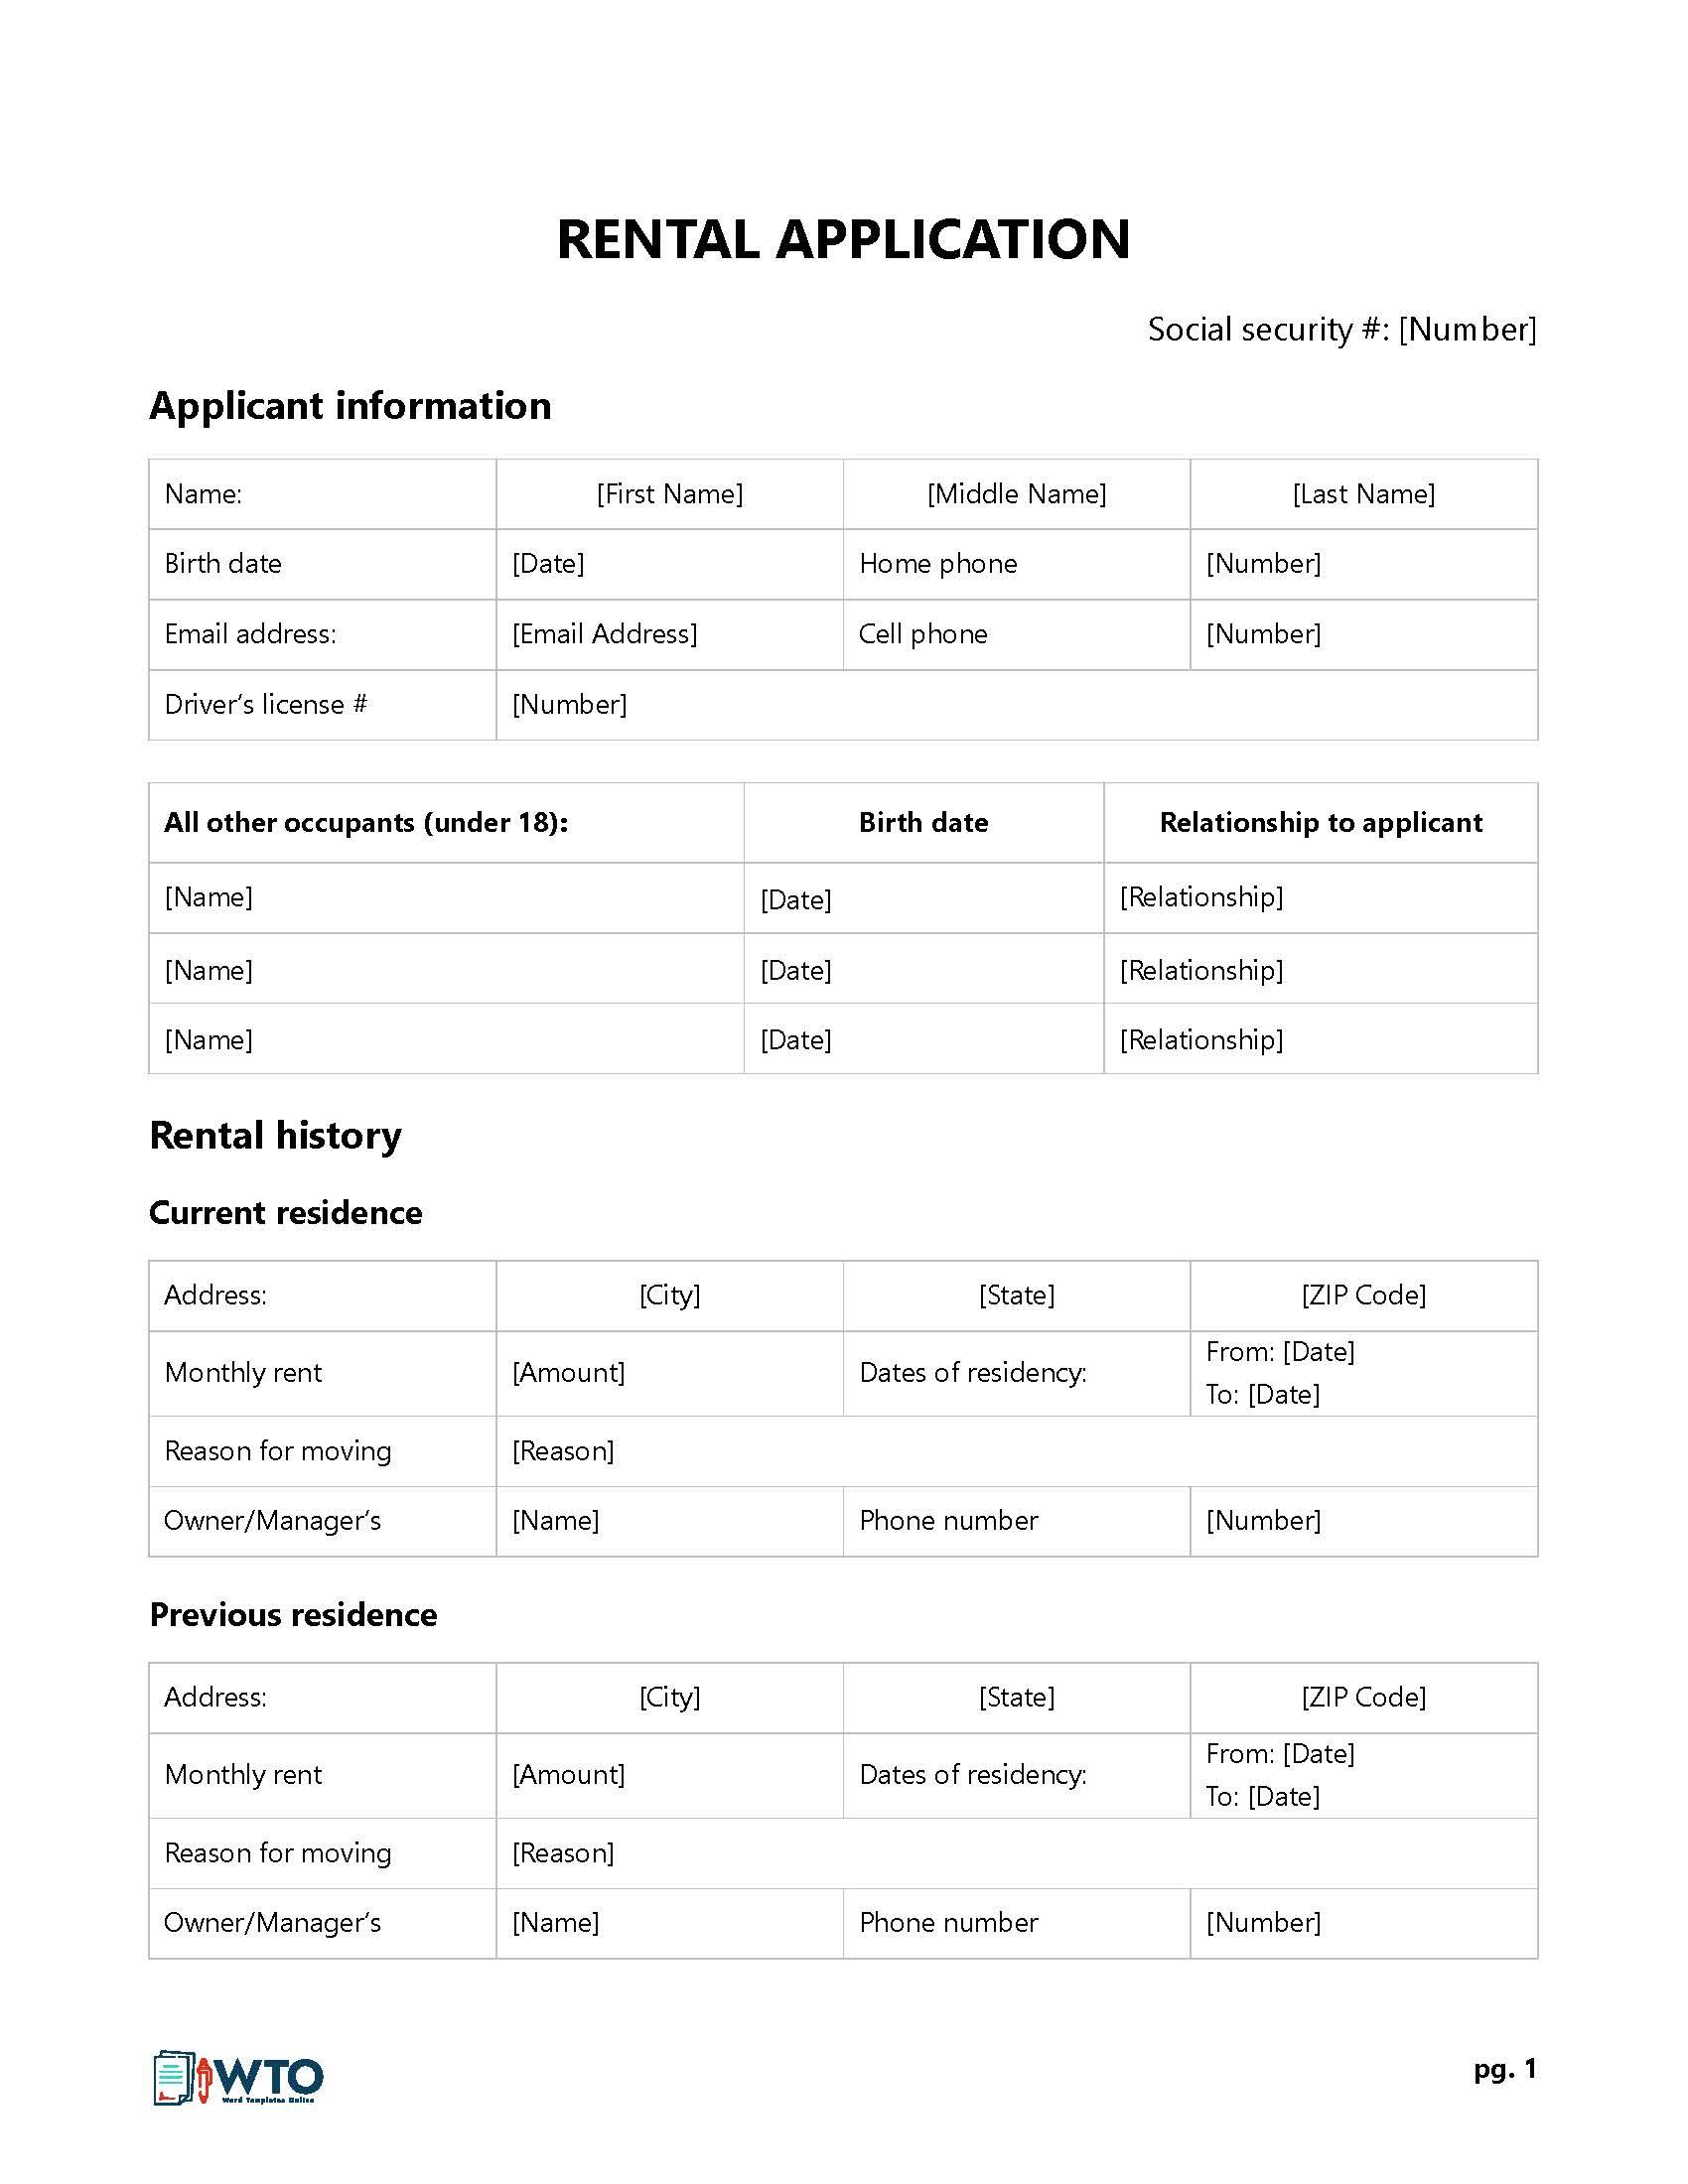 Zillow Rental Application Form